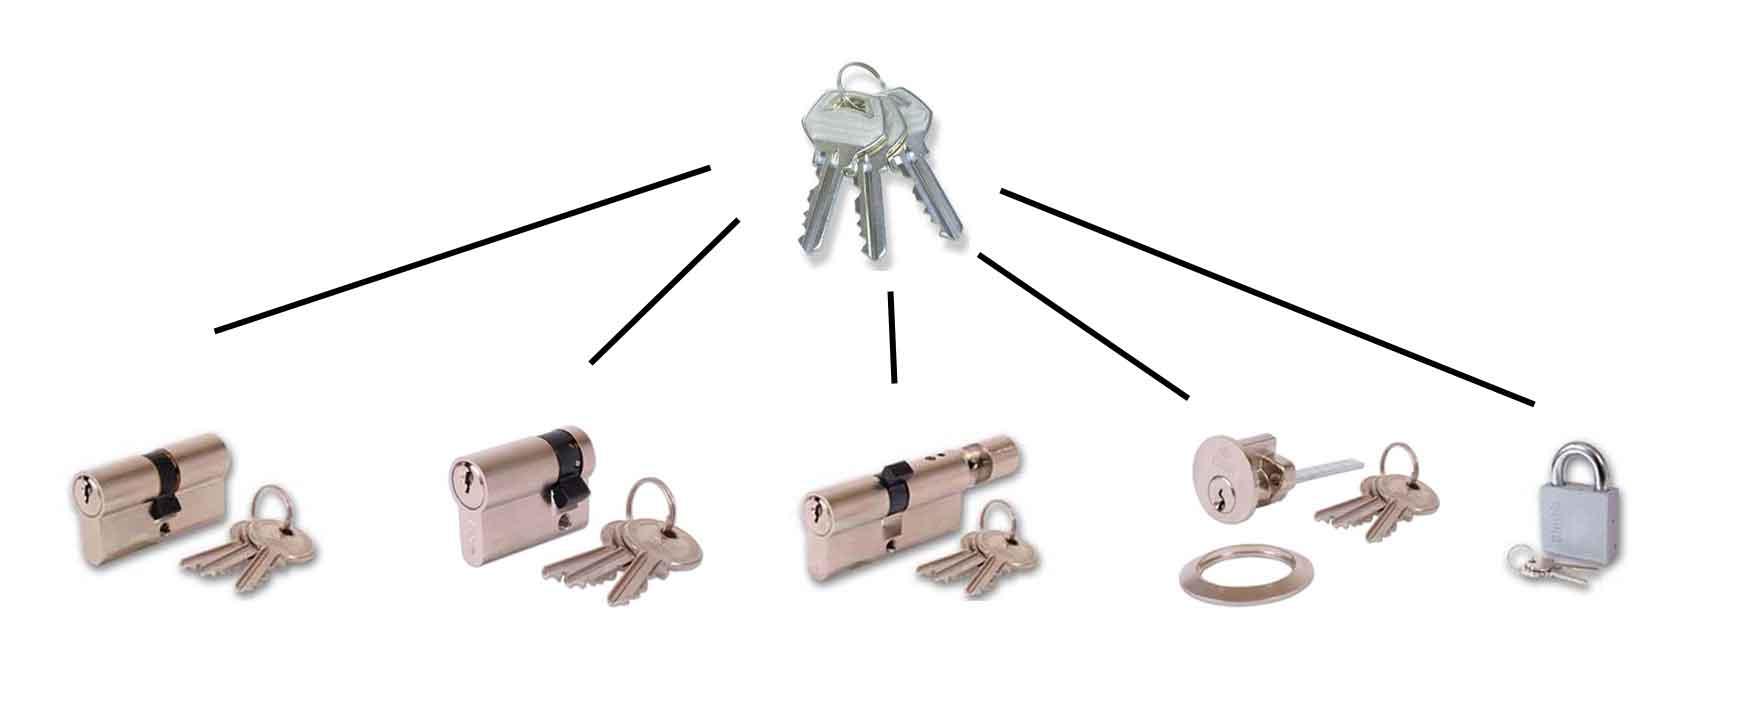 Master lock combinations by key generator